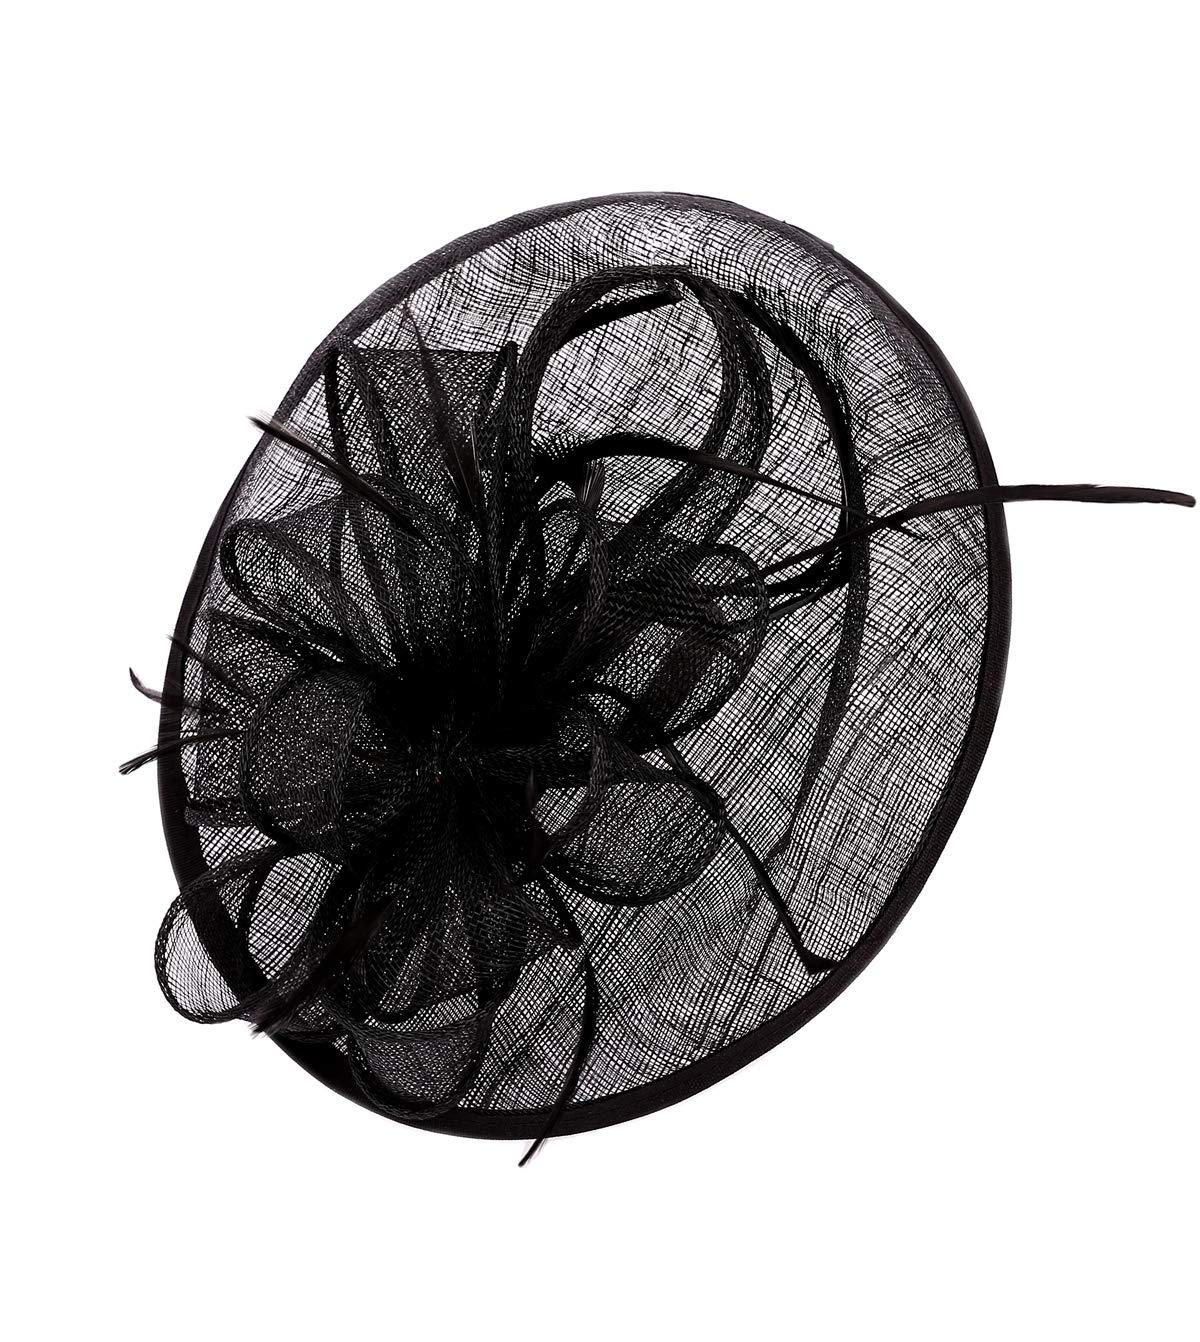 Felizhouse Sinamay Fascinators Wedding Derby Hats for Women Cocktail Tea Party Headband Ladies Head Piece Flower Feather Veil Pillbox Hat Hair Clip (Sinamay Hat - Bowknot Black)